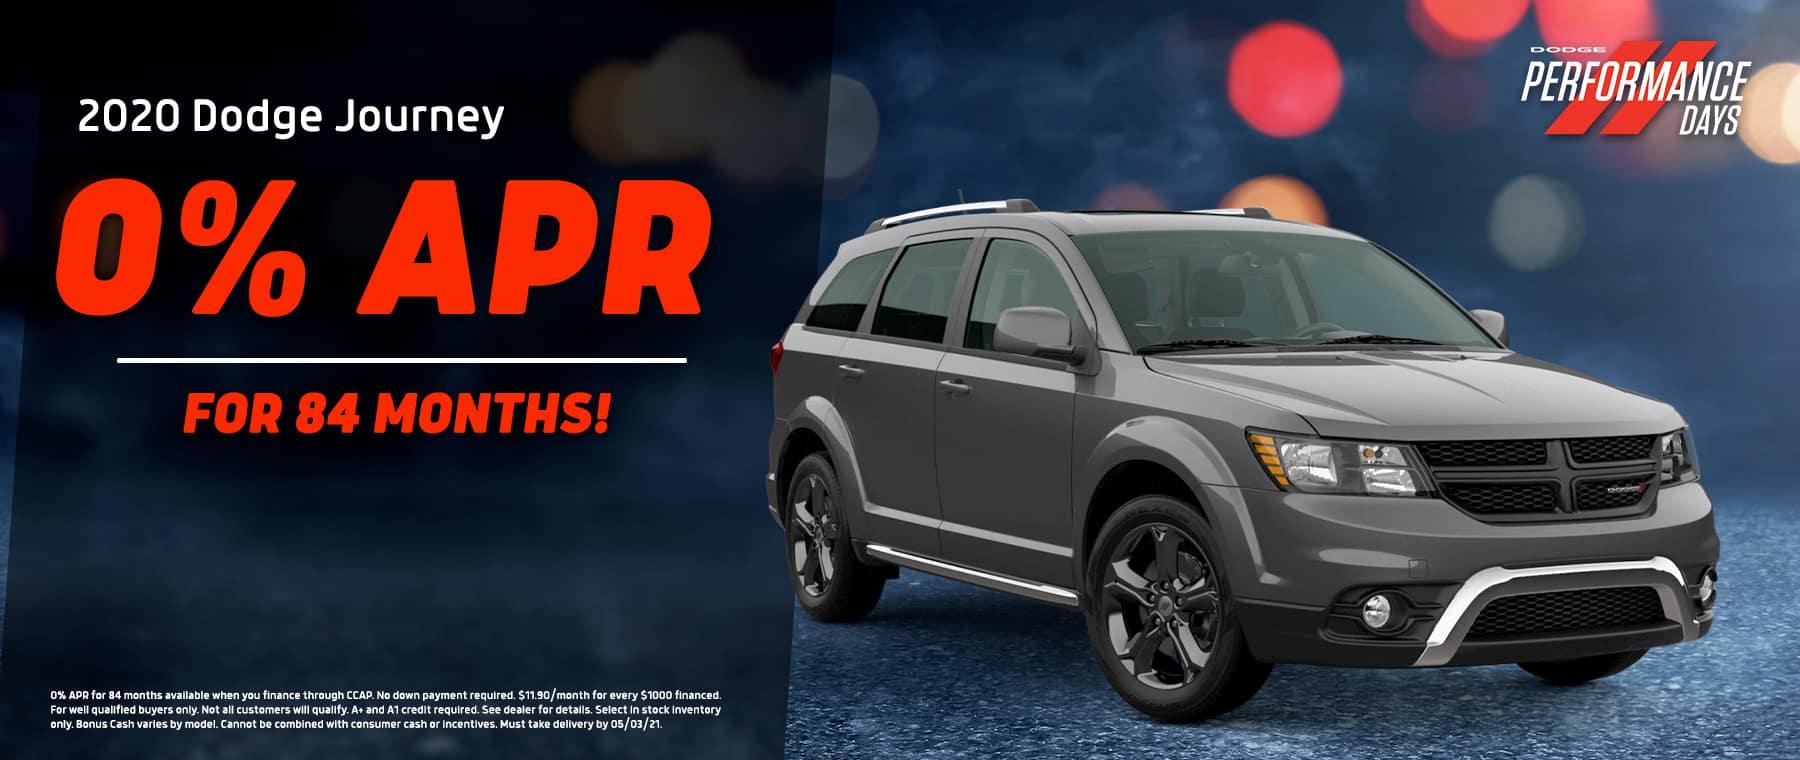 Hendrick-Dodge-RAM-Fiat-Cary-Apri21_TR_Website-Assets-journey-1800×760